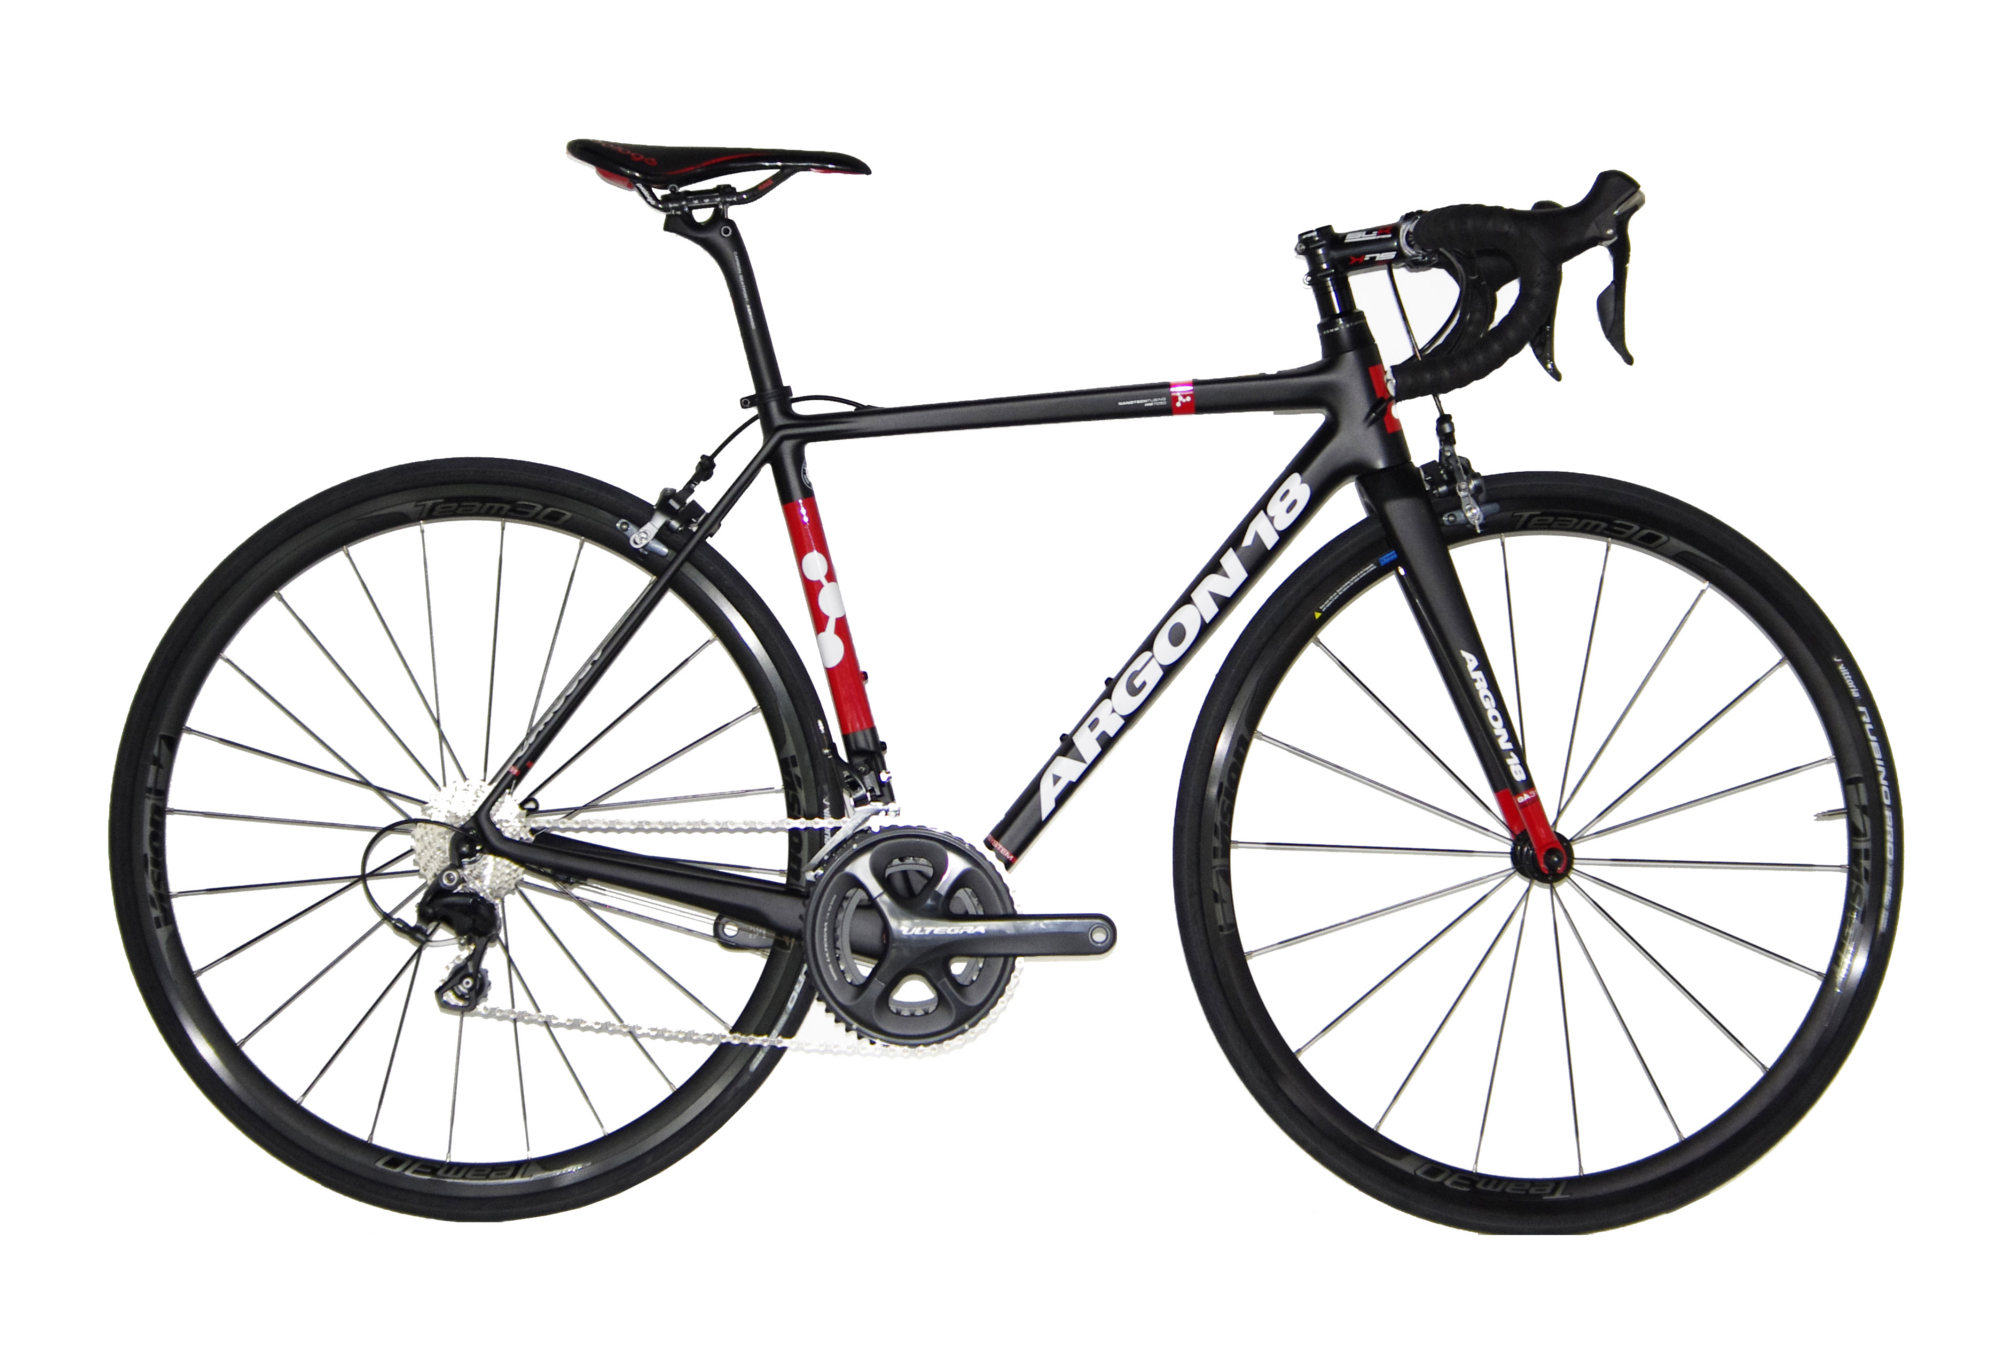 Vélo de Route Argon 18 Gallium Pro Shimano Ultegra 11V